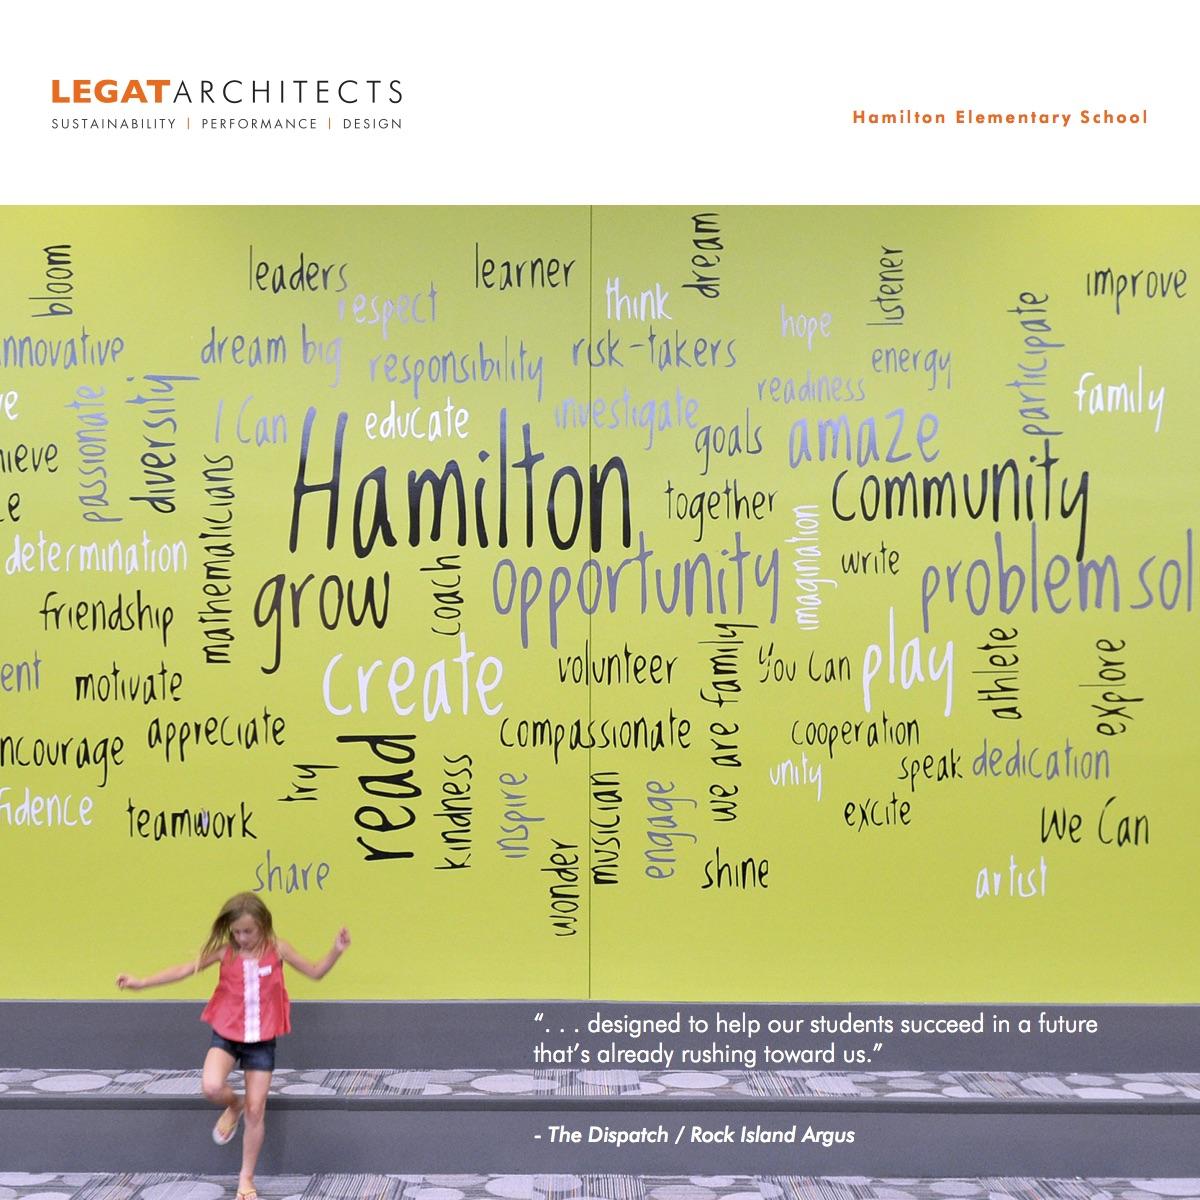 Hamilton Brochure_Final_9-29-15_ISSUU.jpg